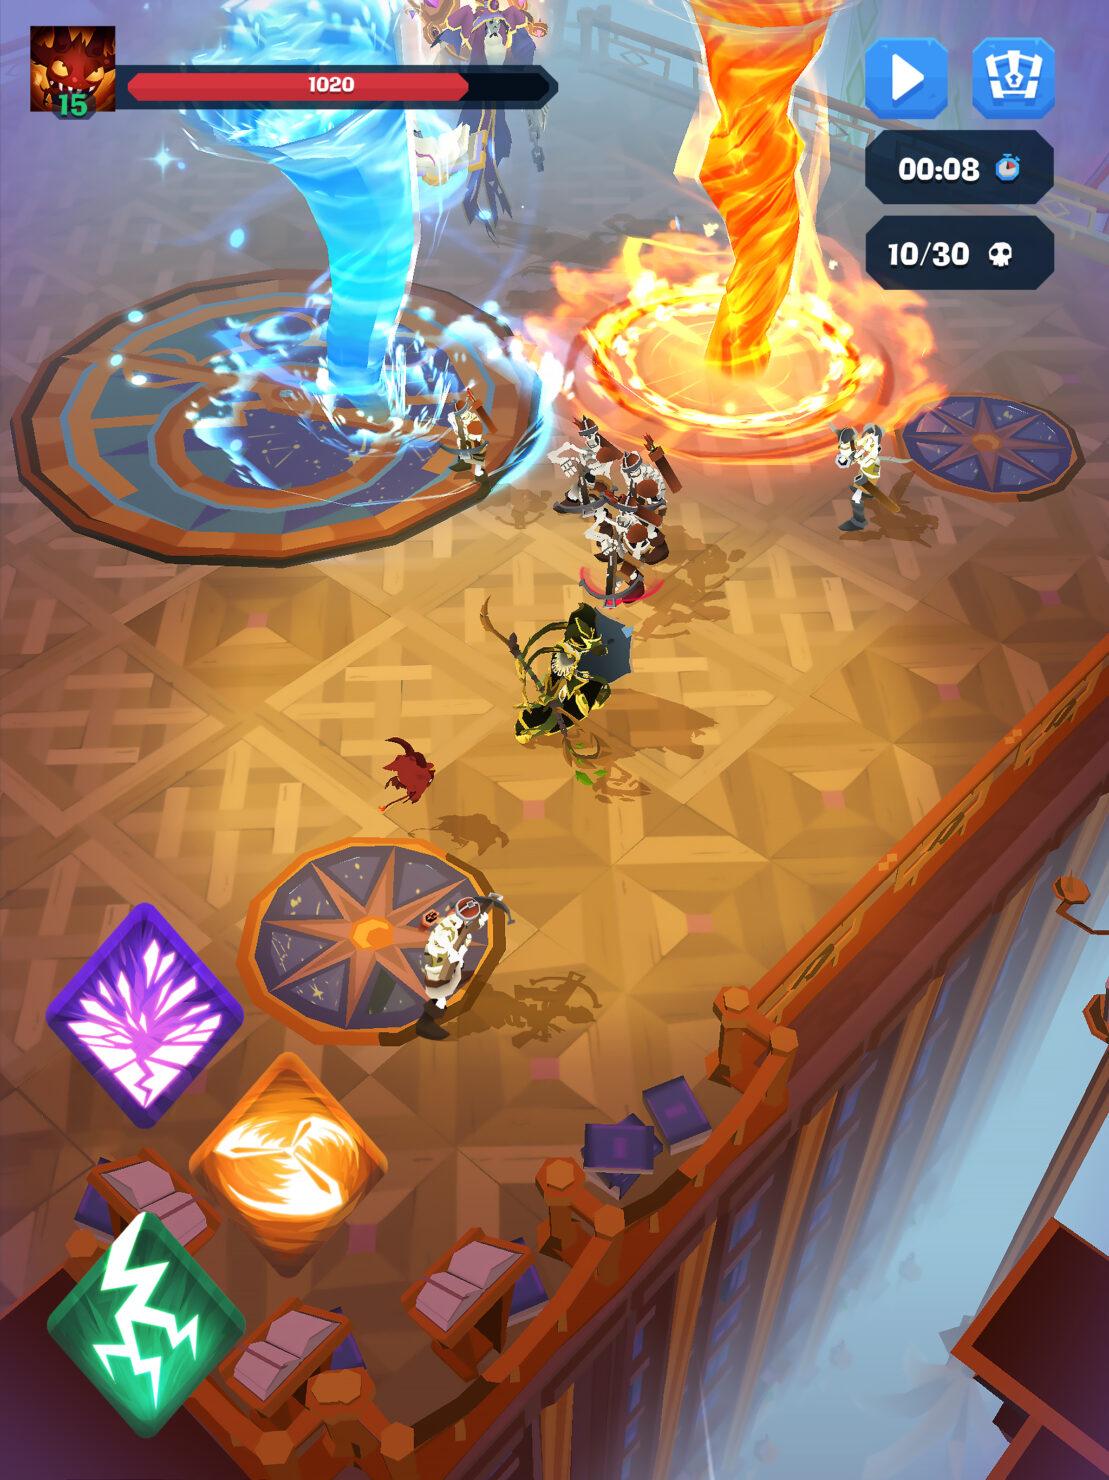 mq_screenshot_side-quest_survival-mode_en